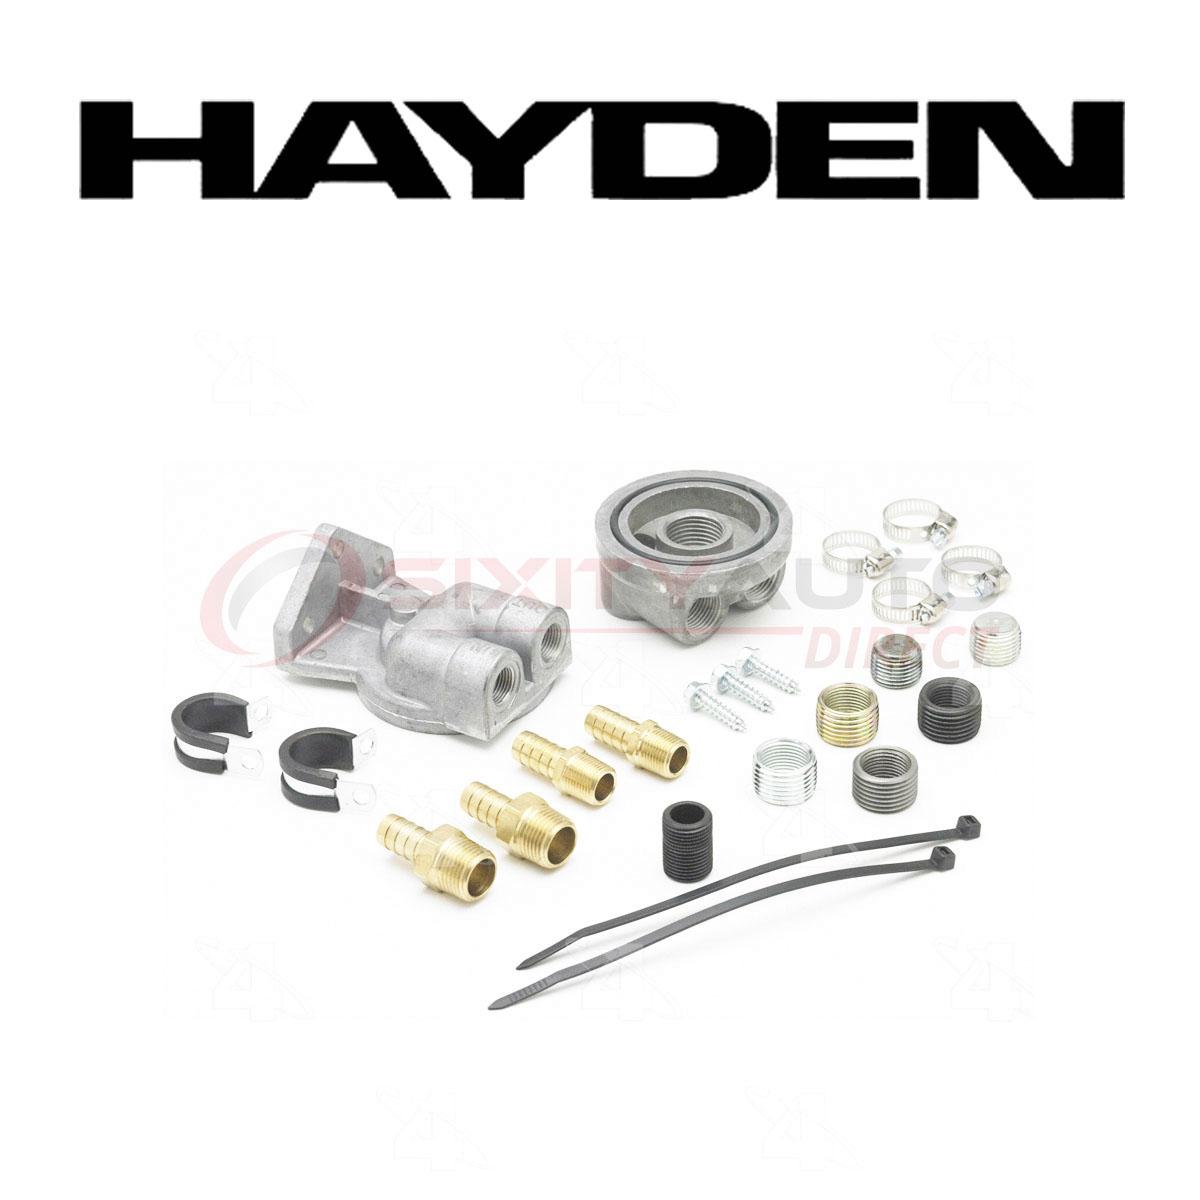 Hayden Oil Filter Remote Mounting Kit for 2005 Nissan